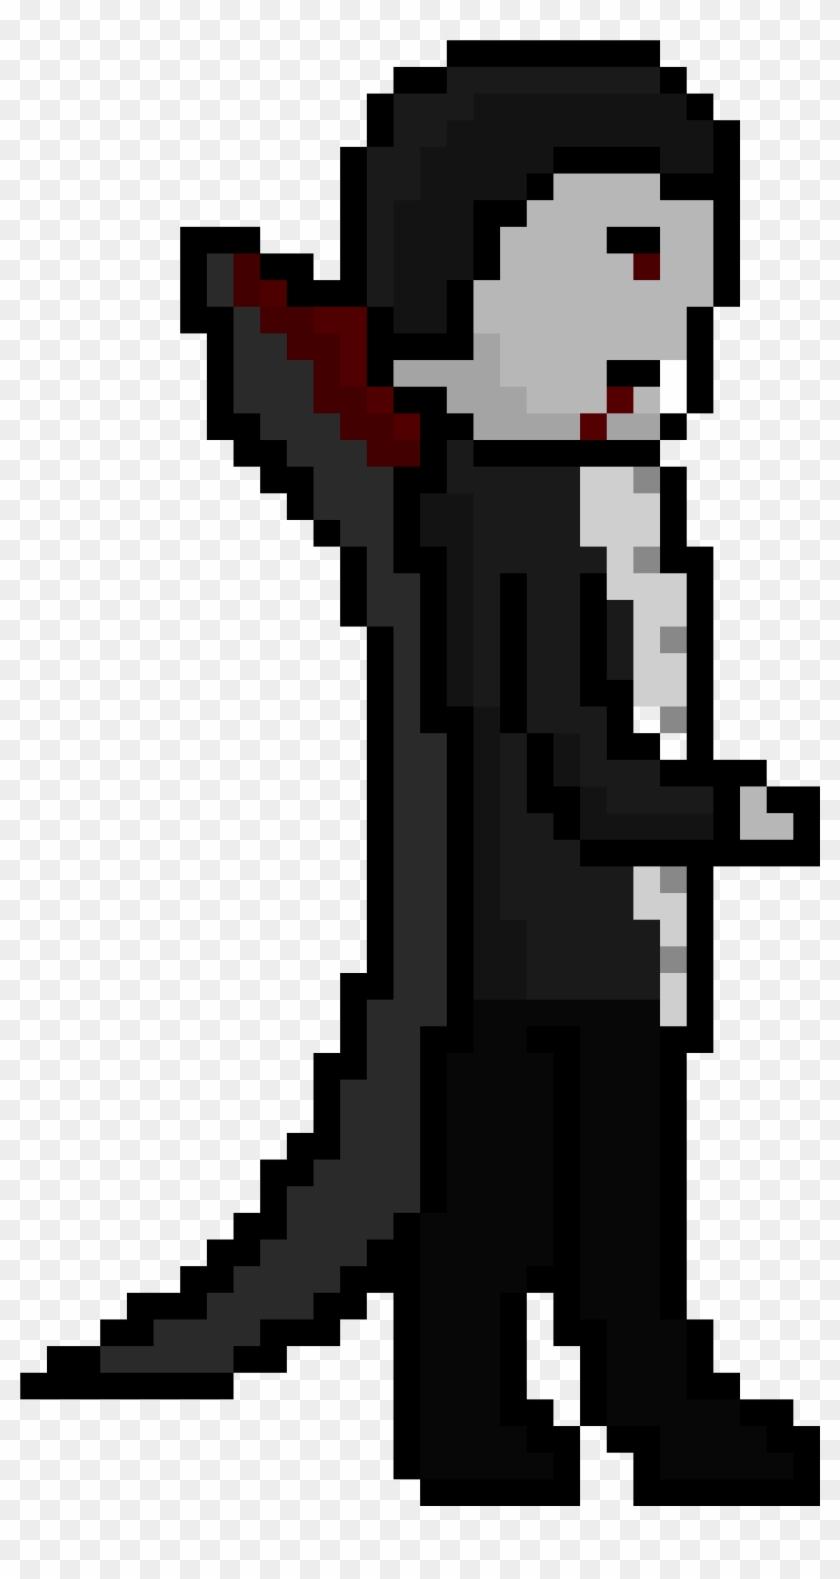 Pixel Art Gif Transparent Pixel Art Vampire Gif Hd Png Download